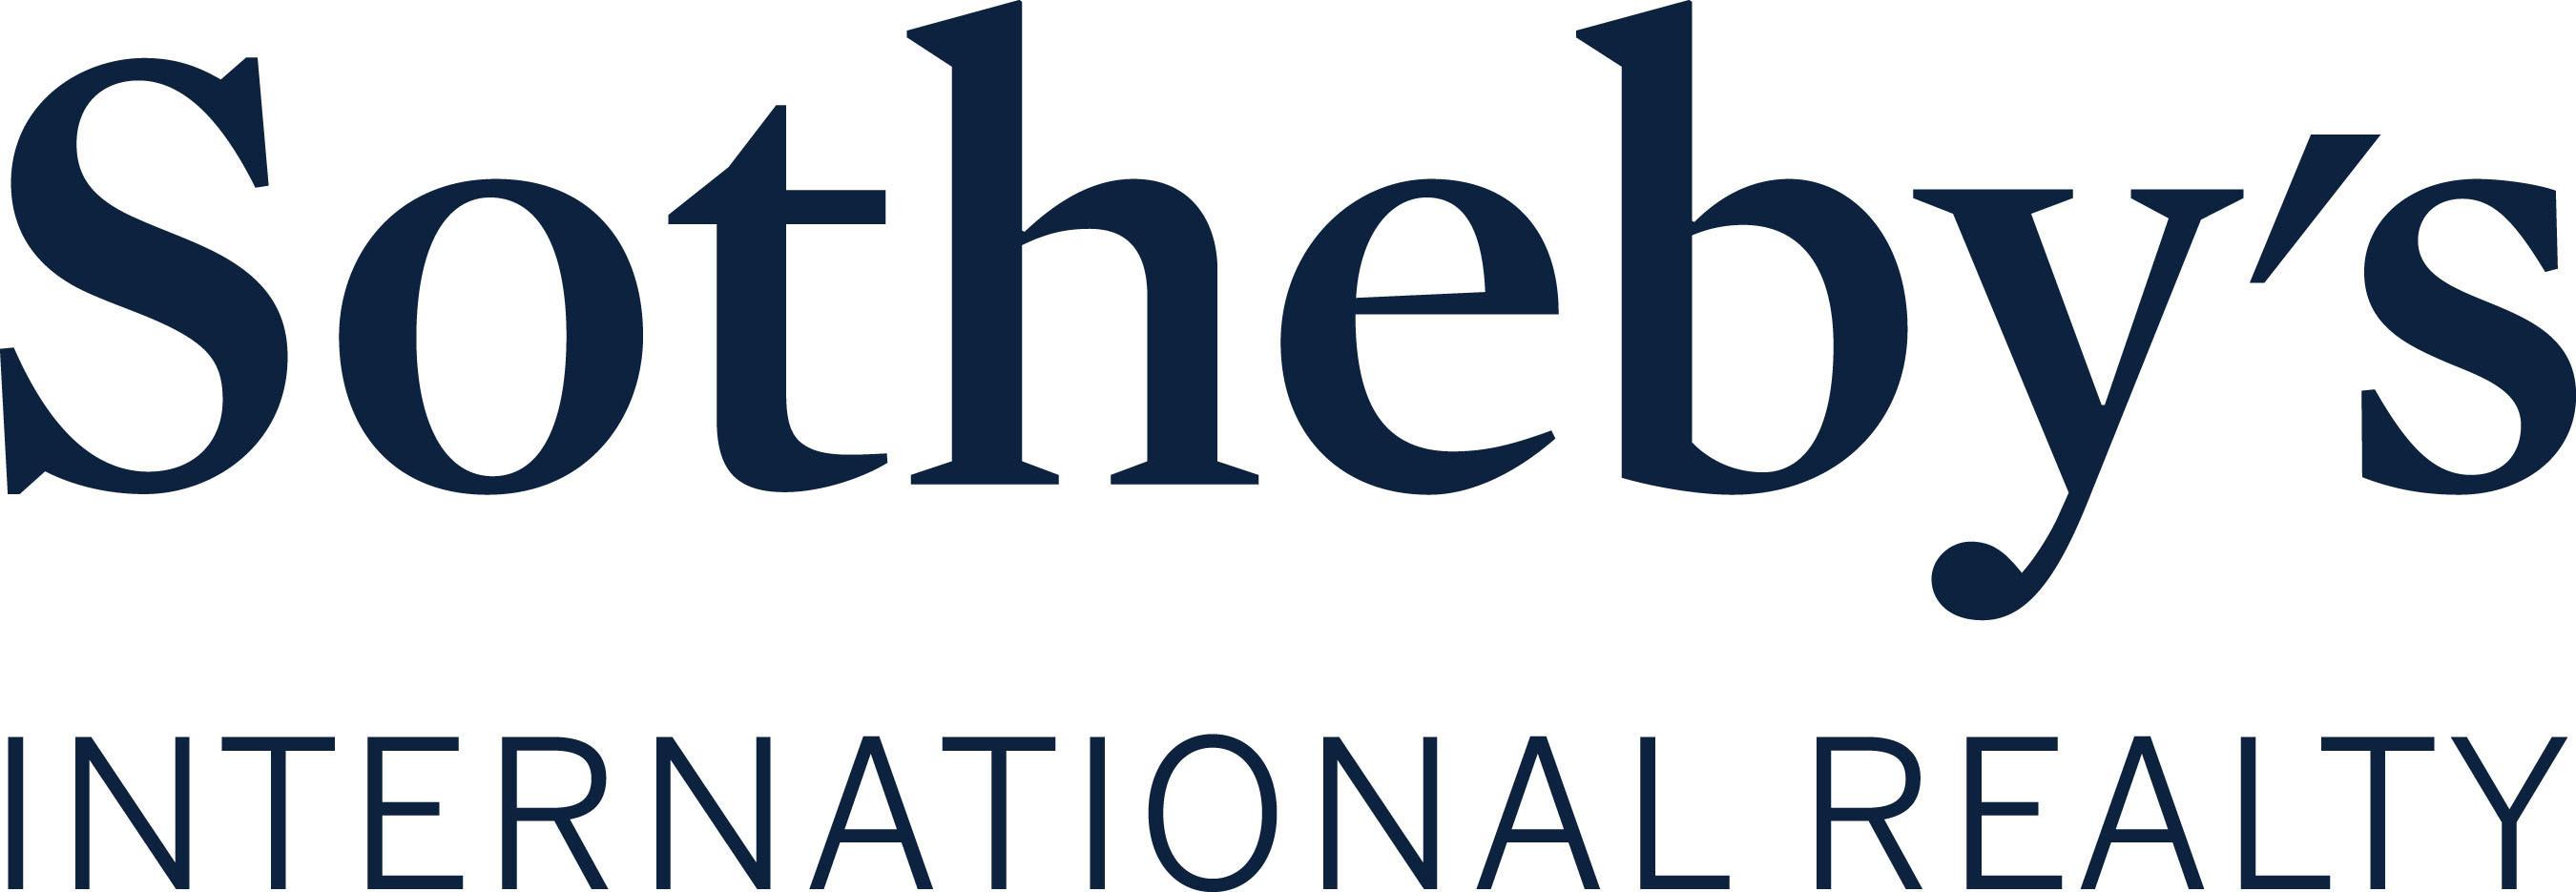 Sotheby's International Realty logo.